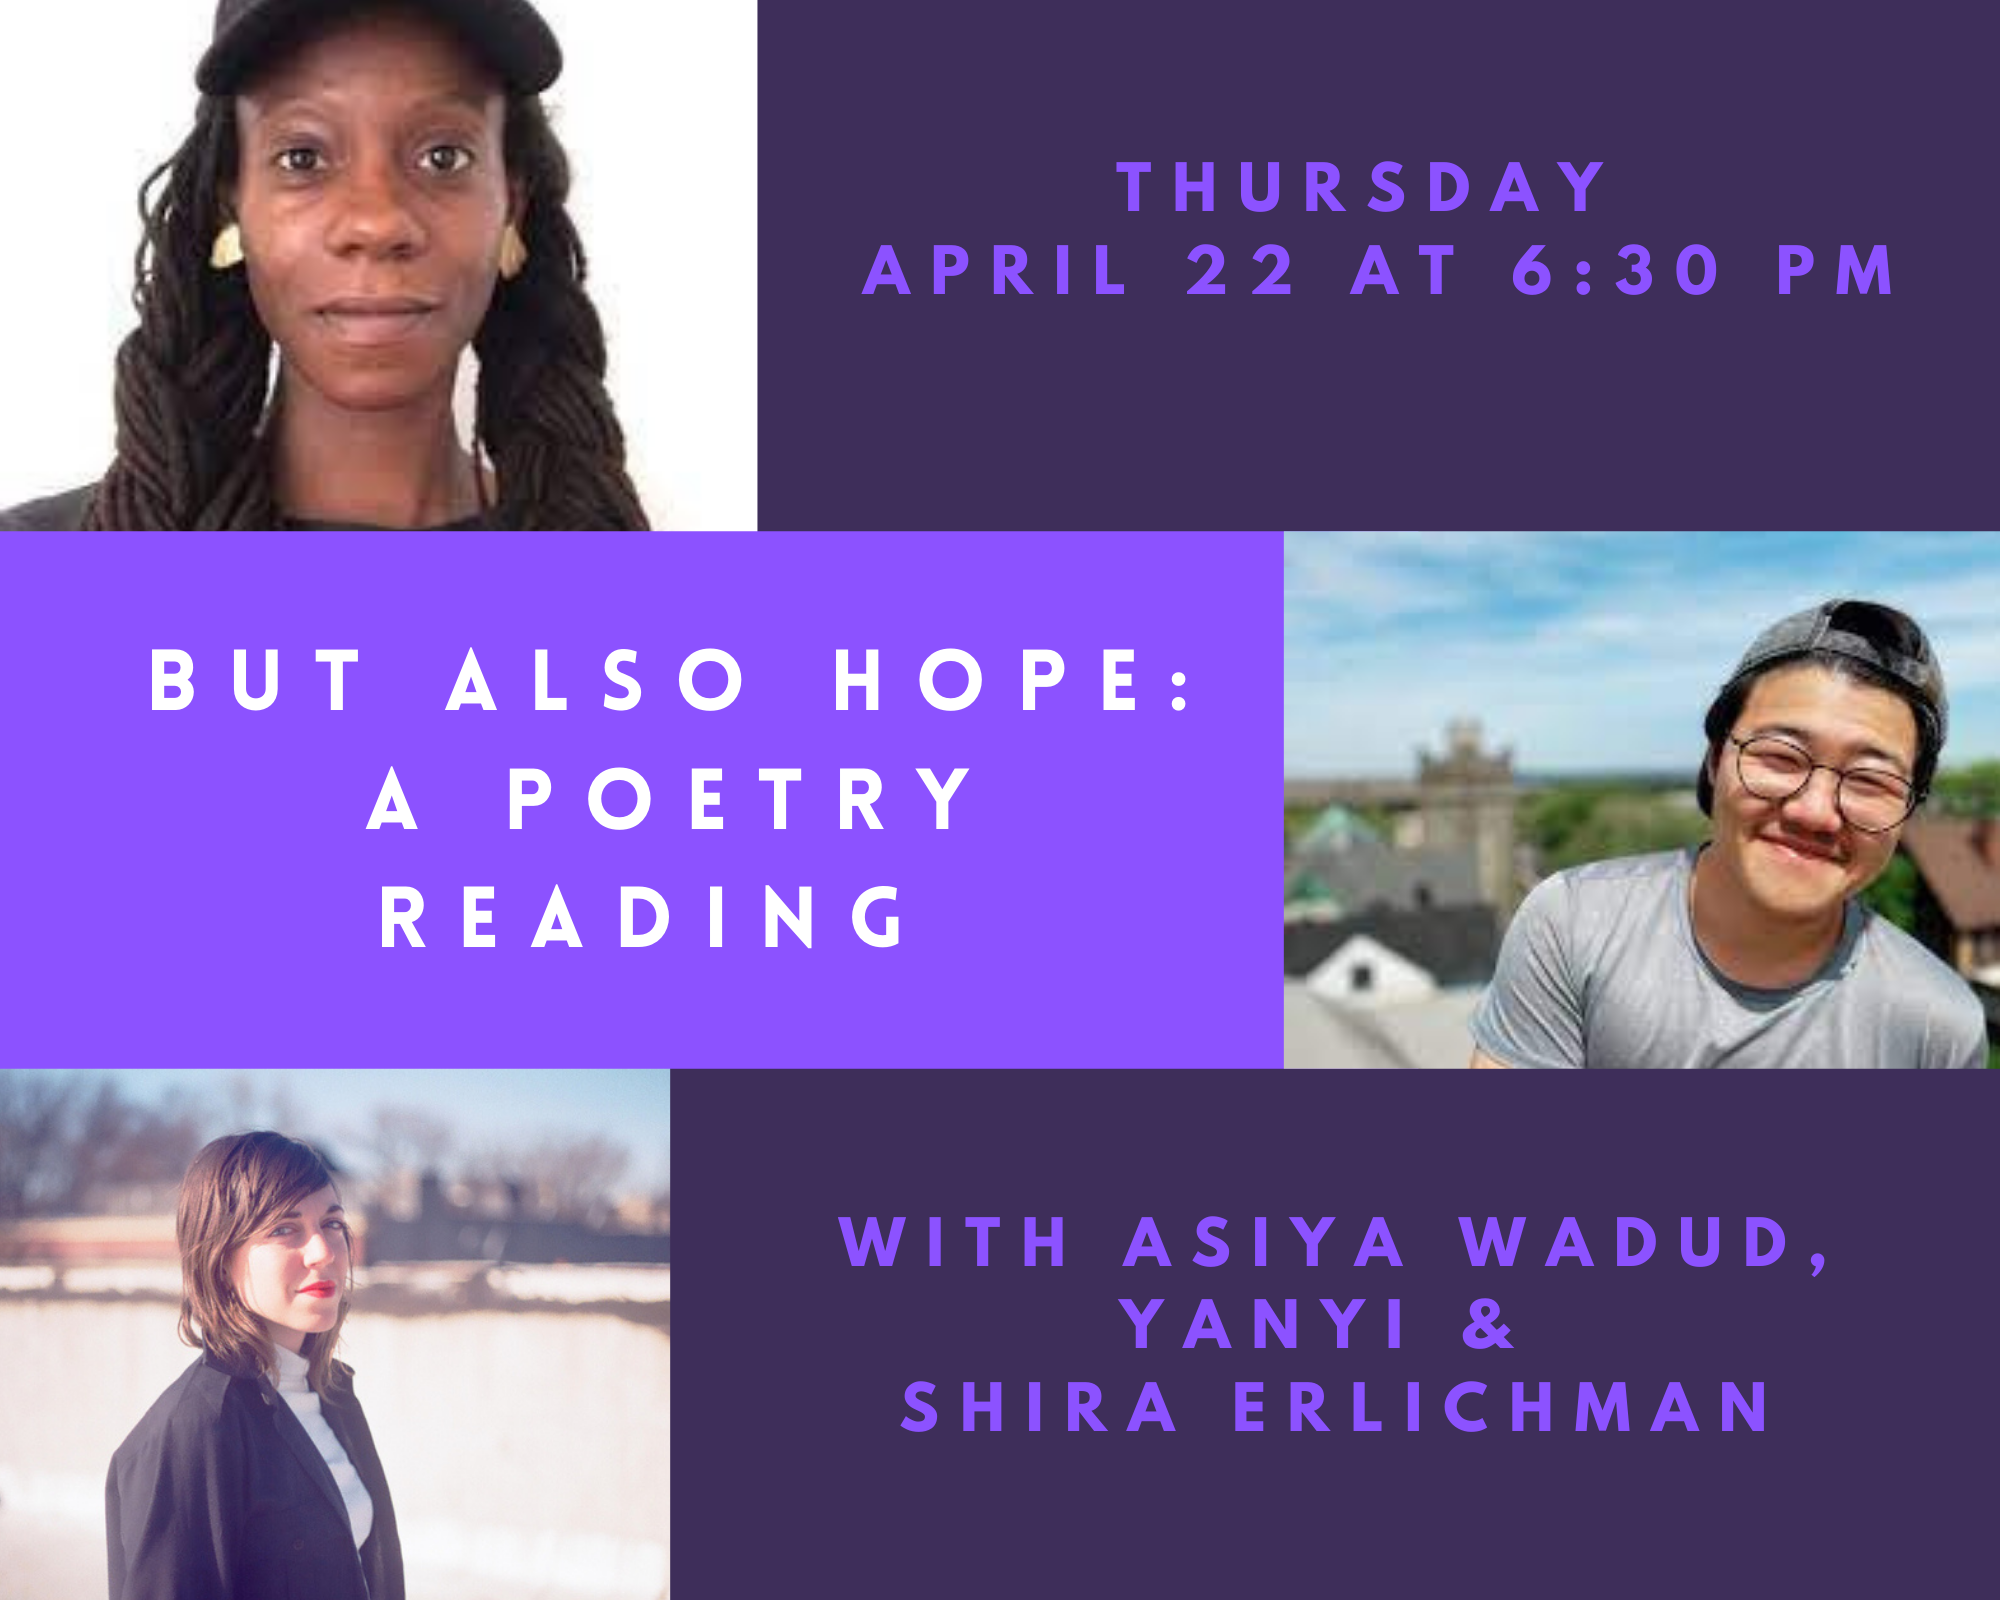 www.cambridgema.gov: BUT ALSO HOPE: A Poetry Reading with Yanyi, Shira Erlichman, & Asiya Wadud